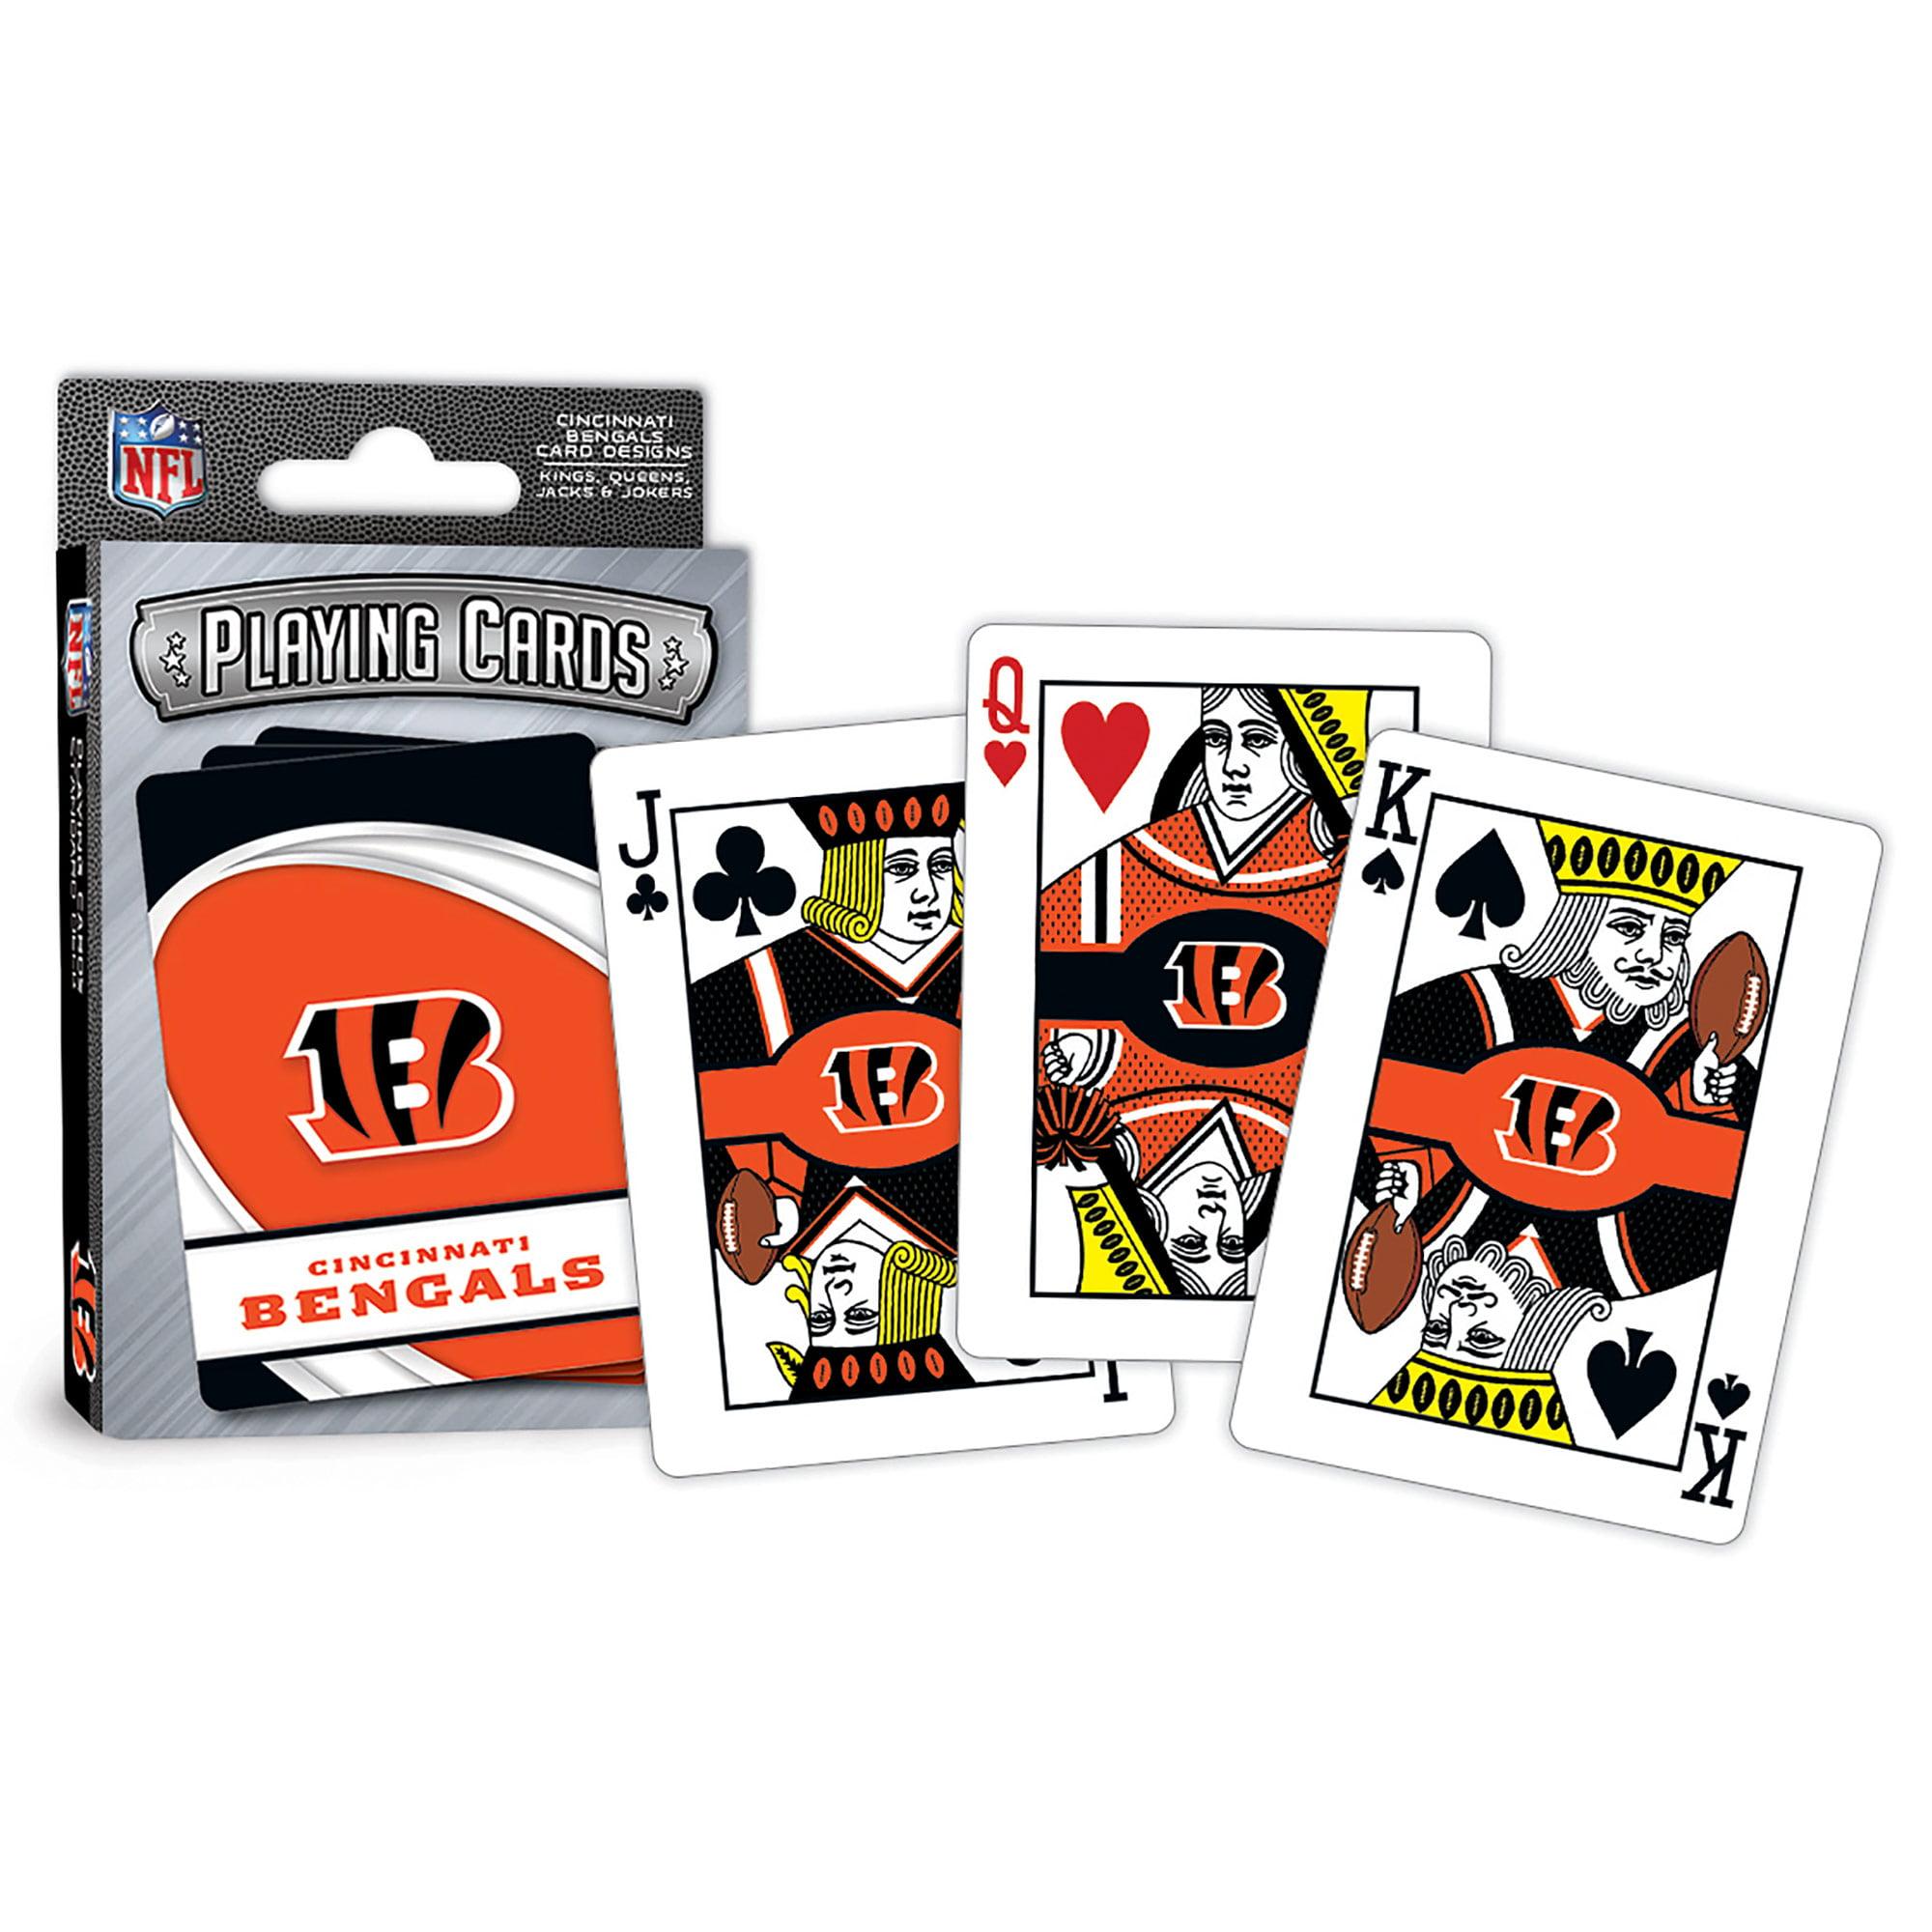 MasterPieces Cincinnati Bengals Playing Cards